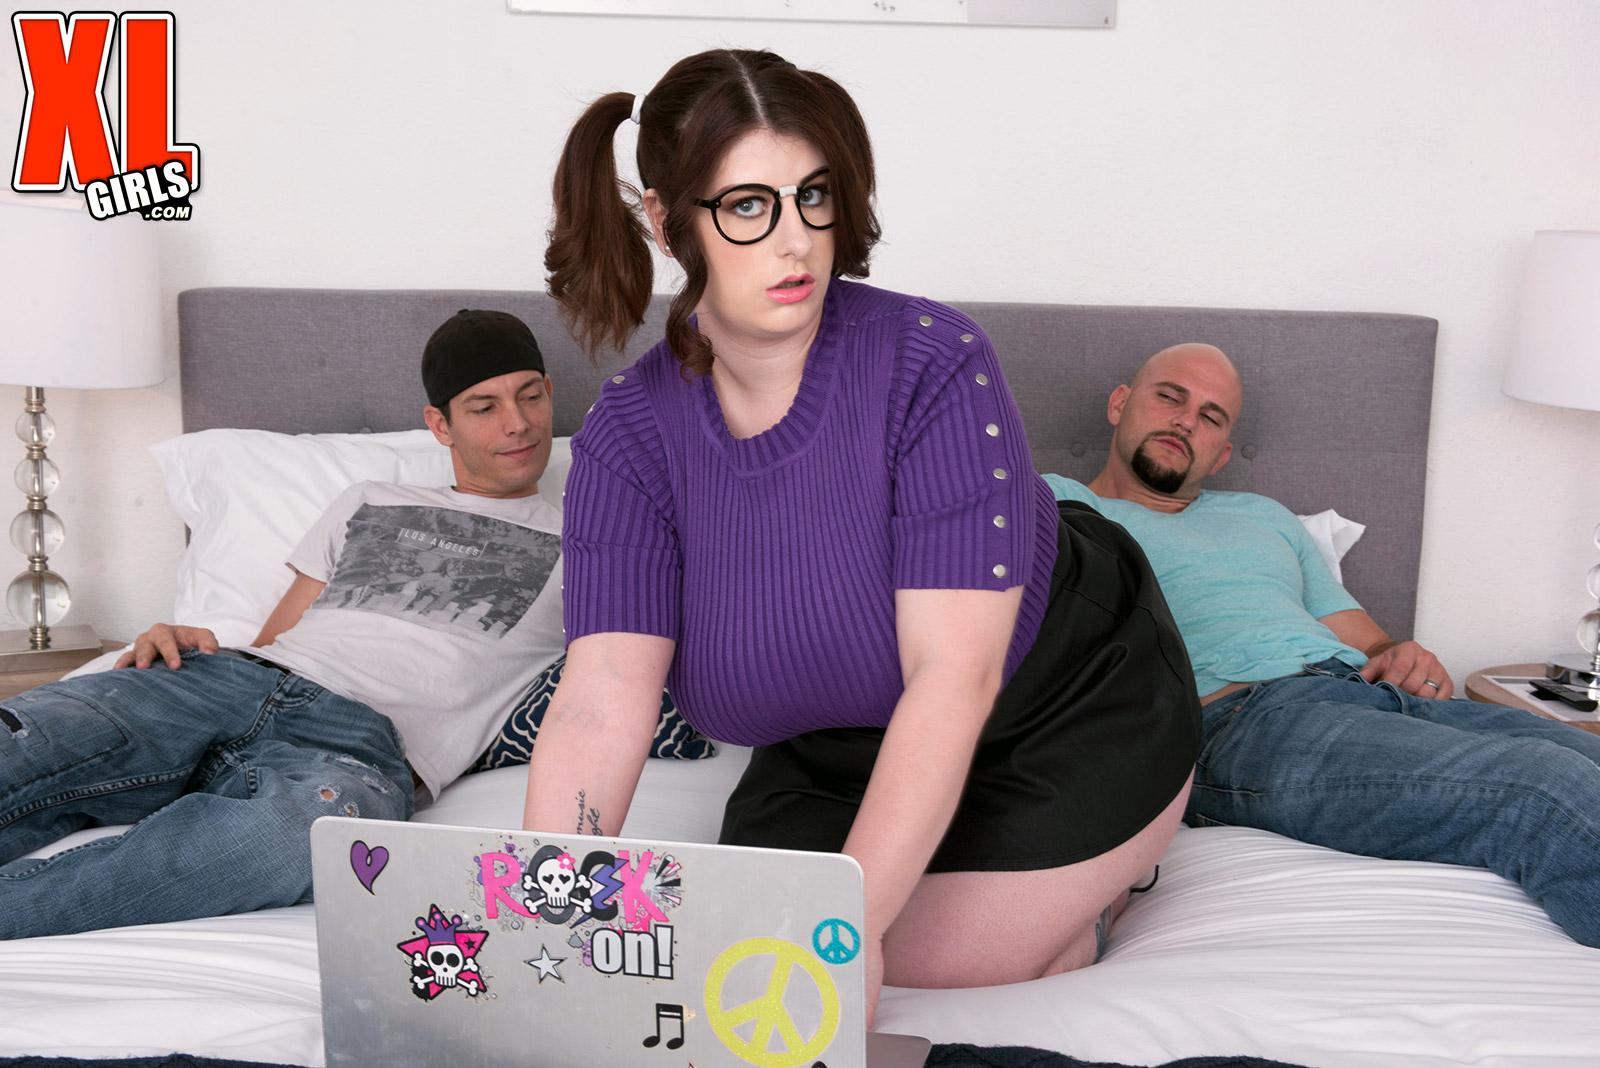 pussy art online